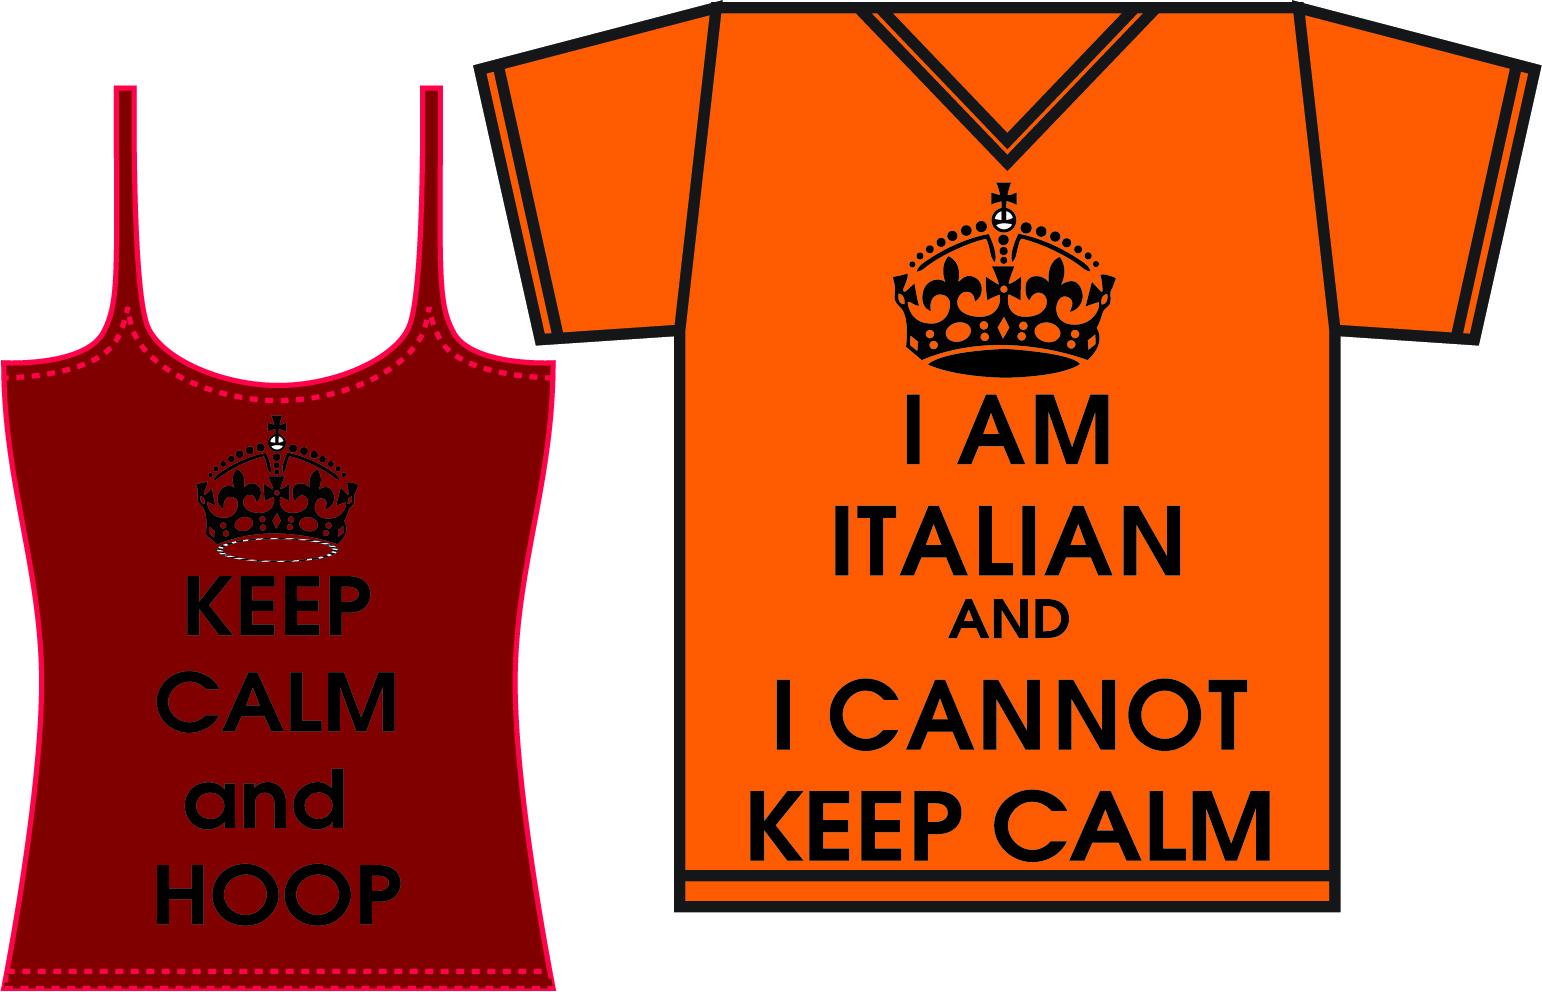 T shirt design keep calm - Posted